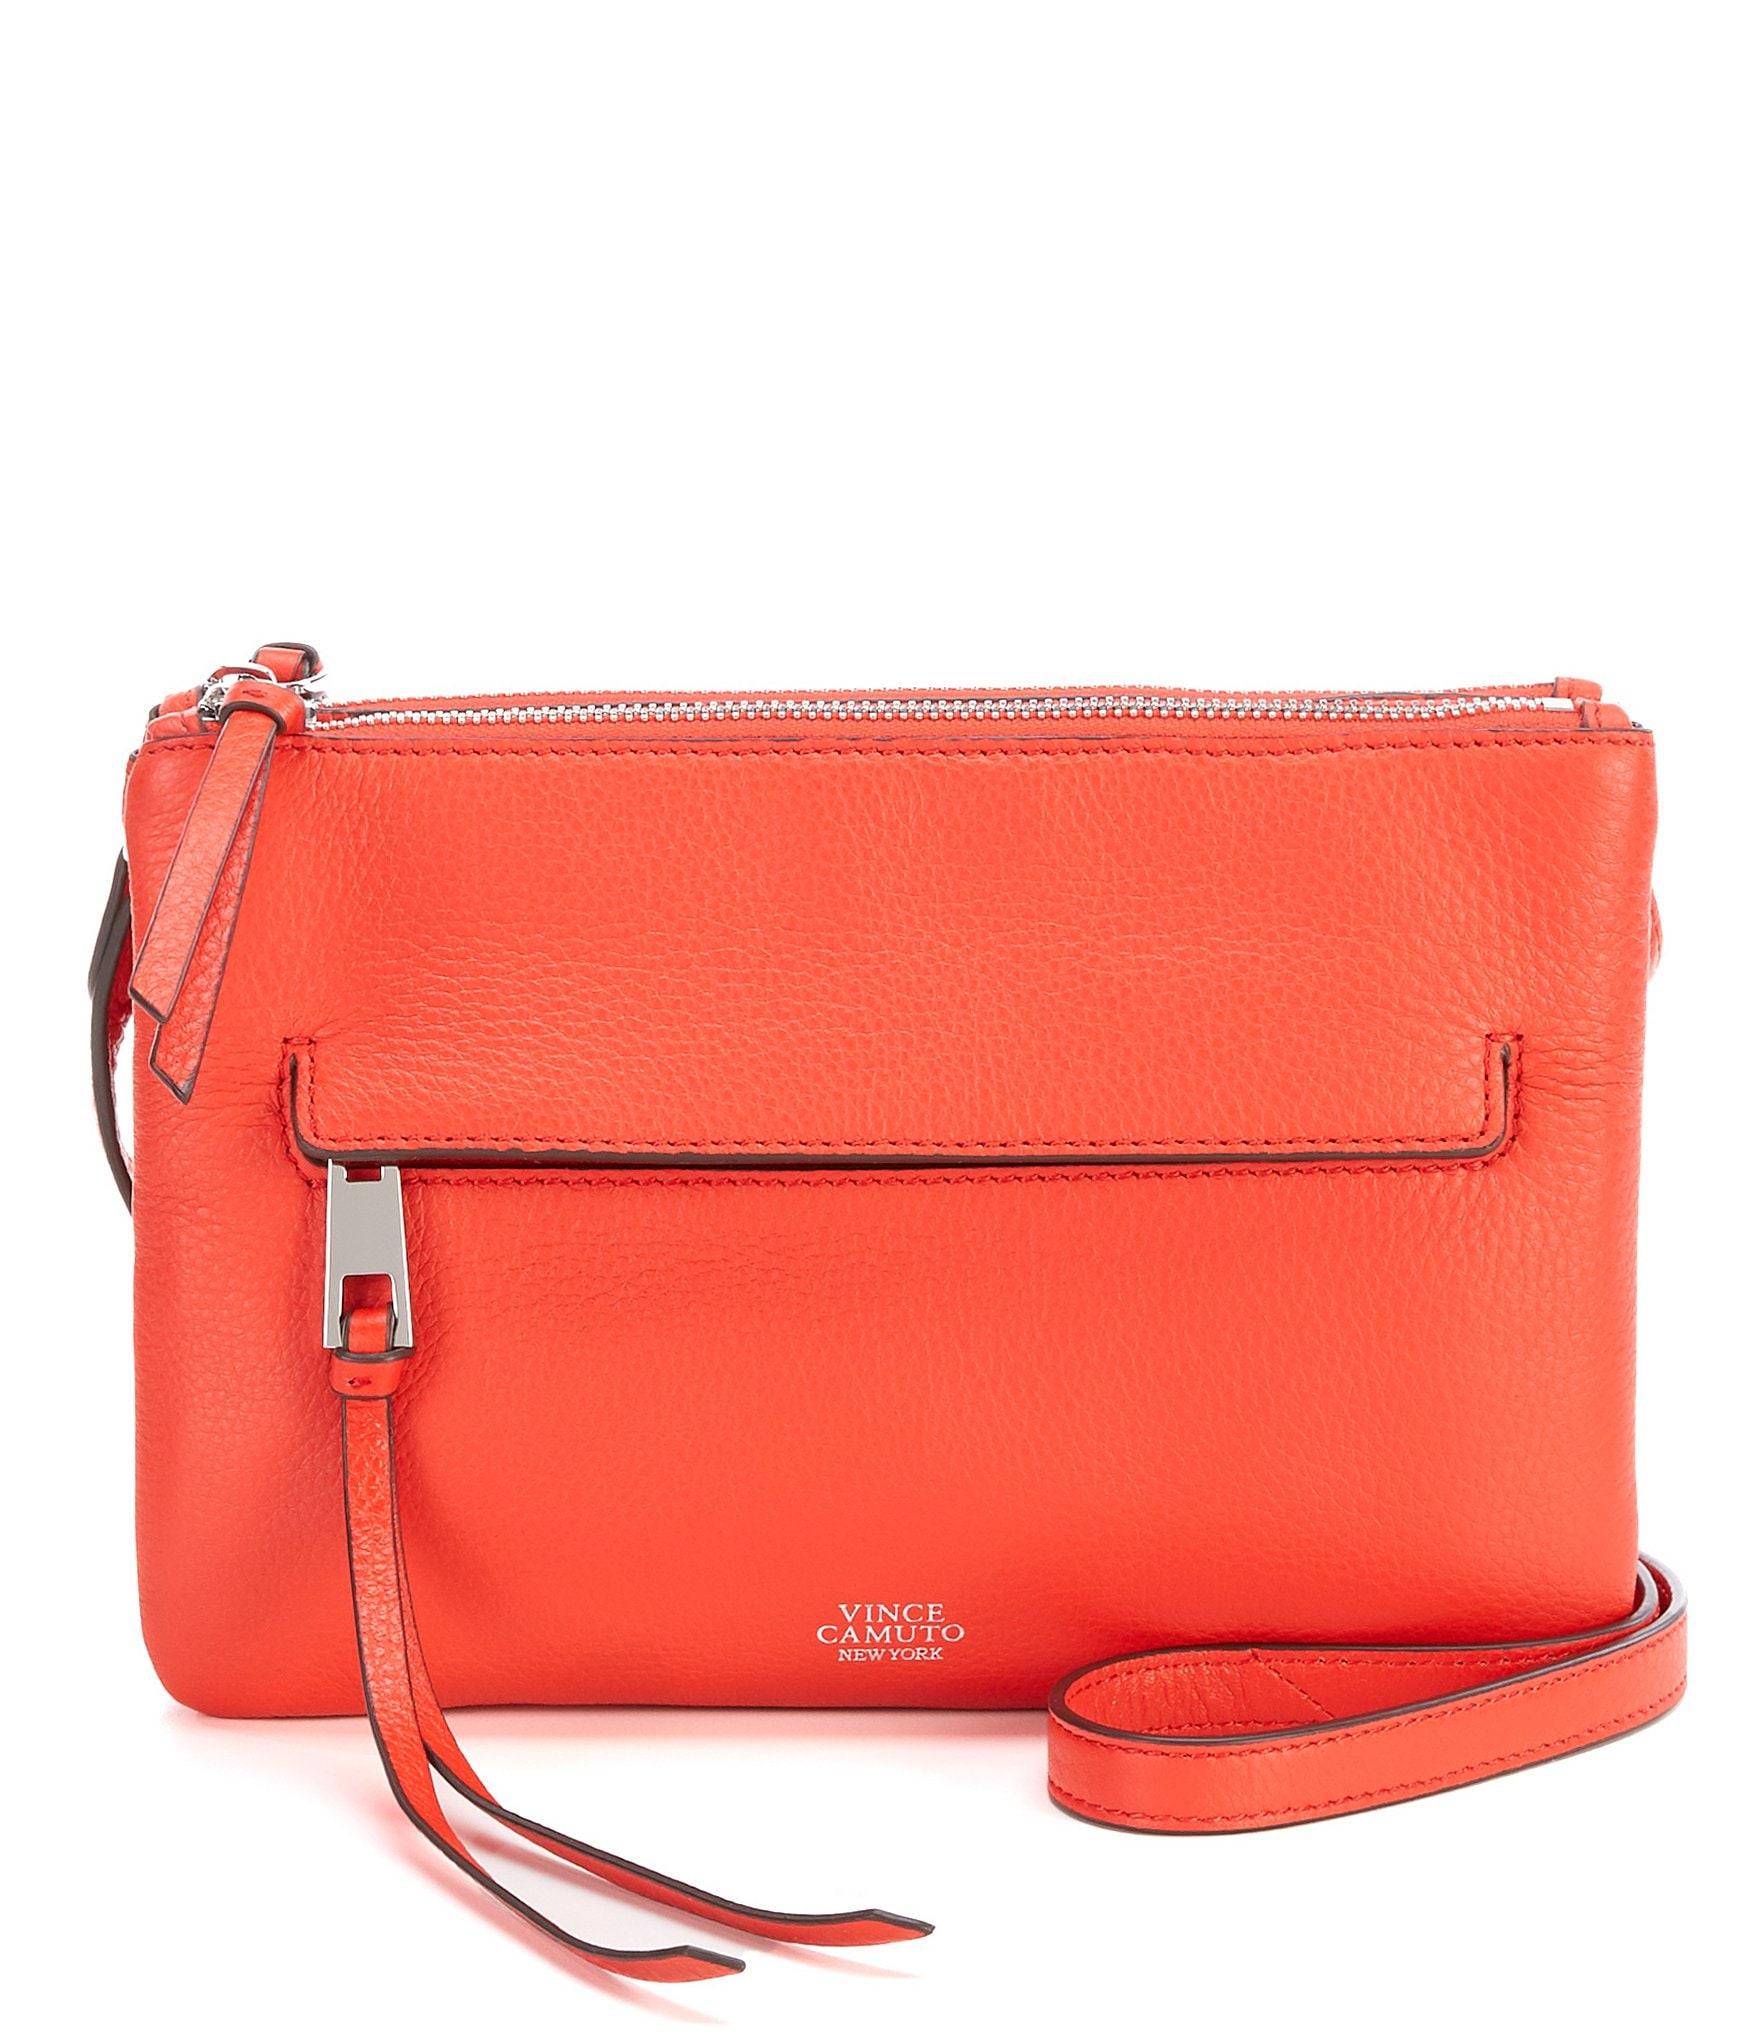 Vince Camuto Gally Cross-Body Bag | Dillards